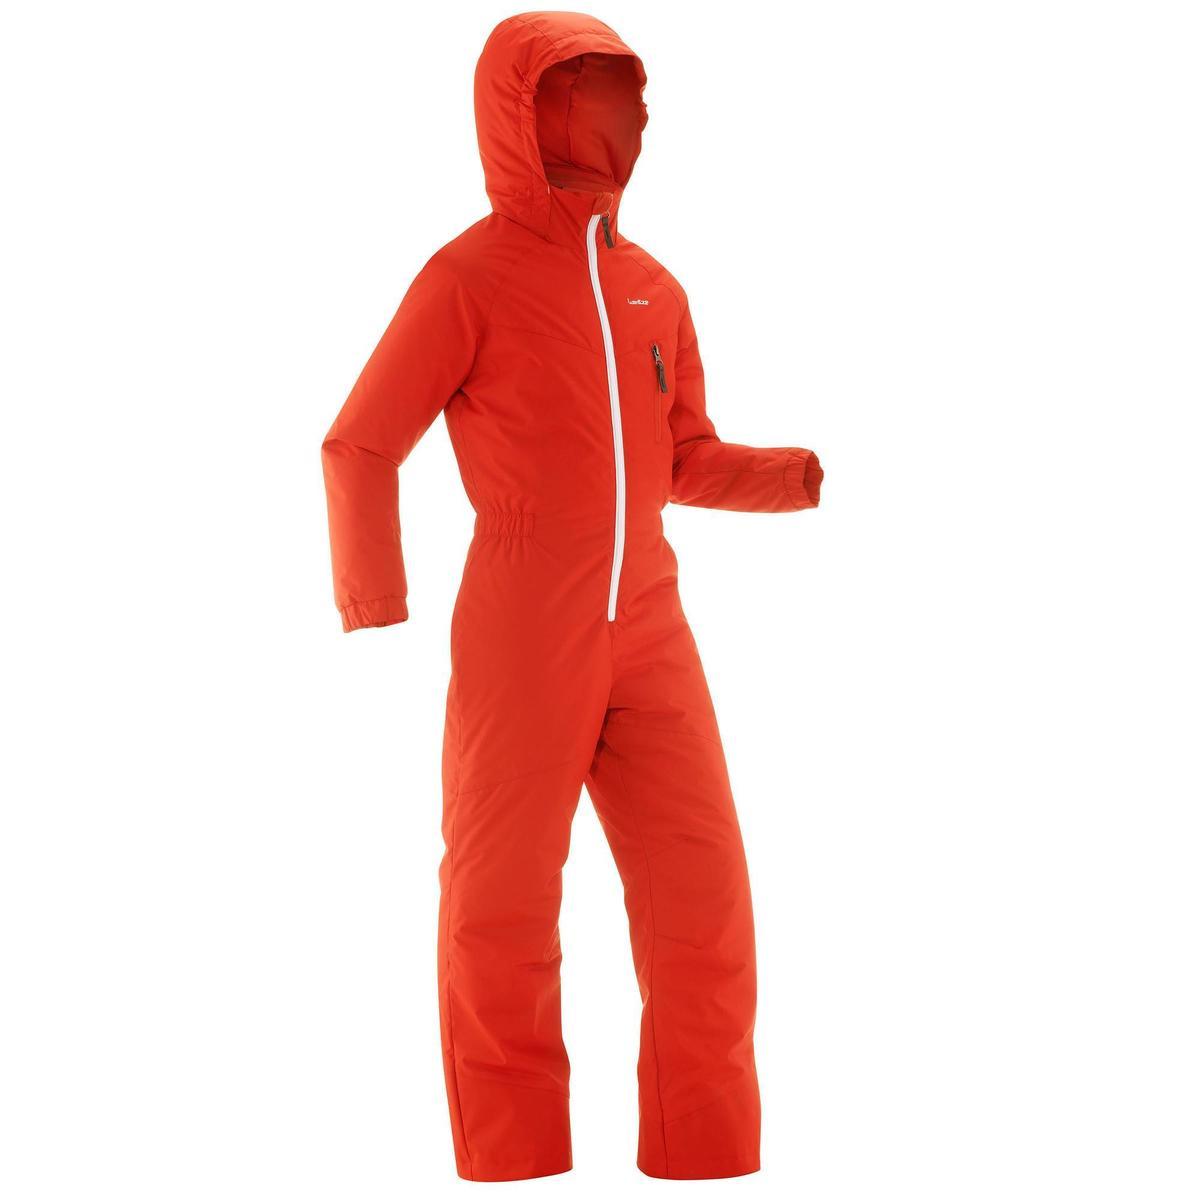 Bild 1 von Skianzug GL 100 Kinder rot/orange